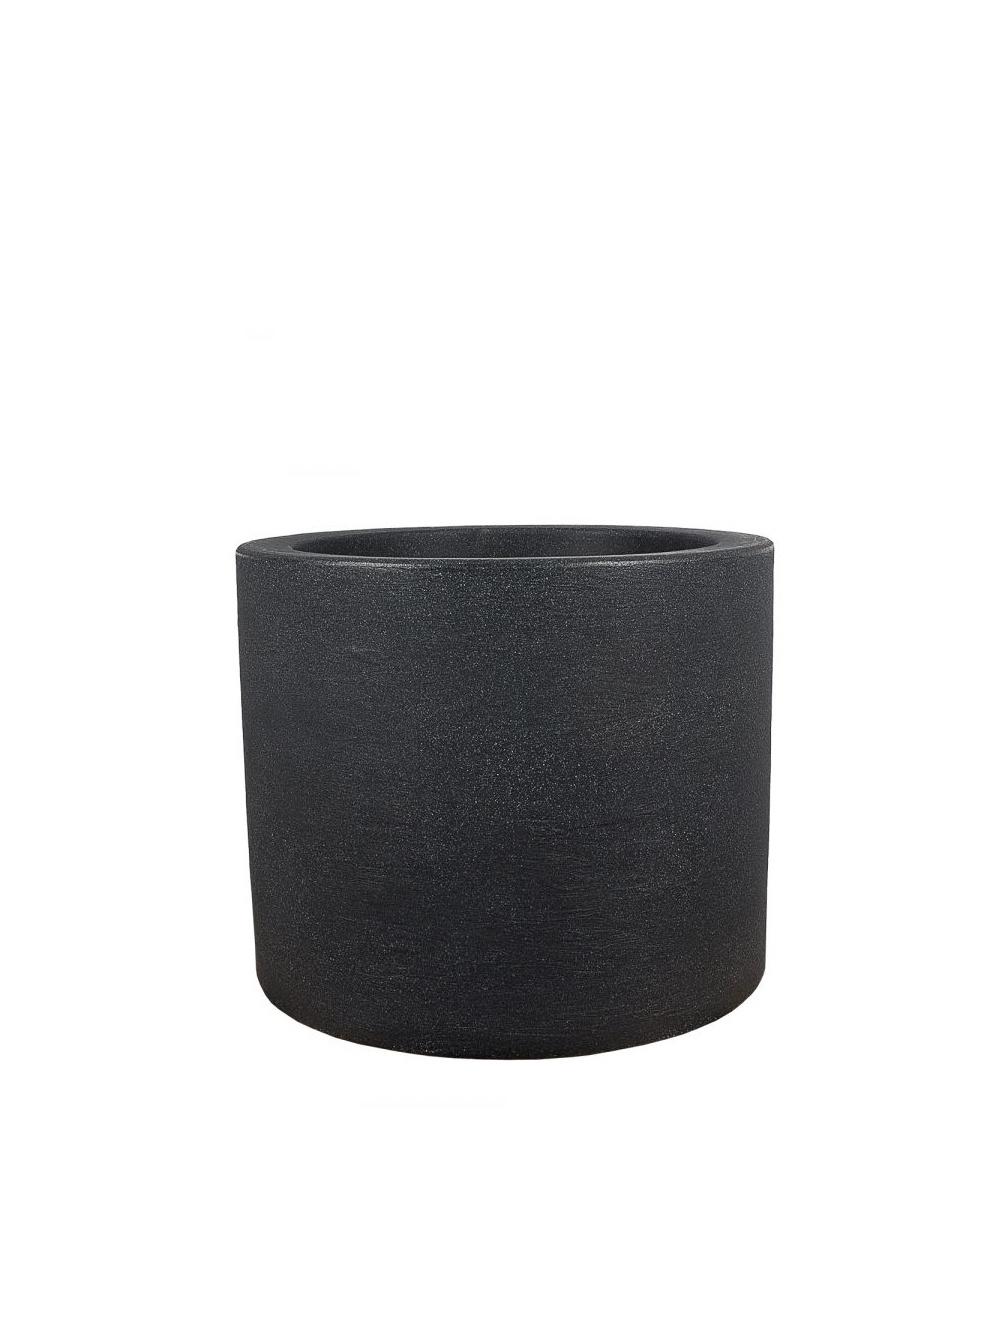 kunststoff-pflanzkubel-cup-anthrazit-39cm-x-33cm